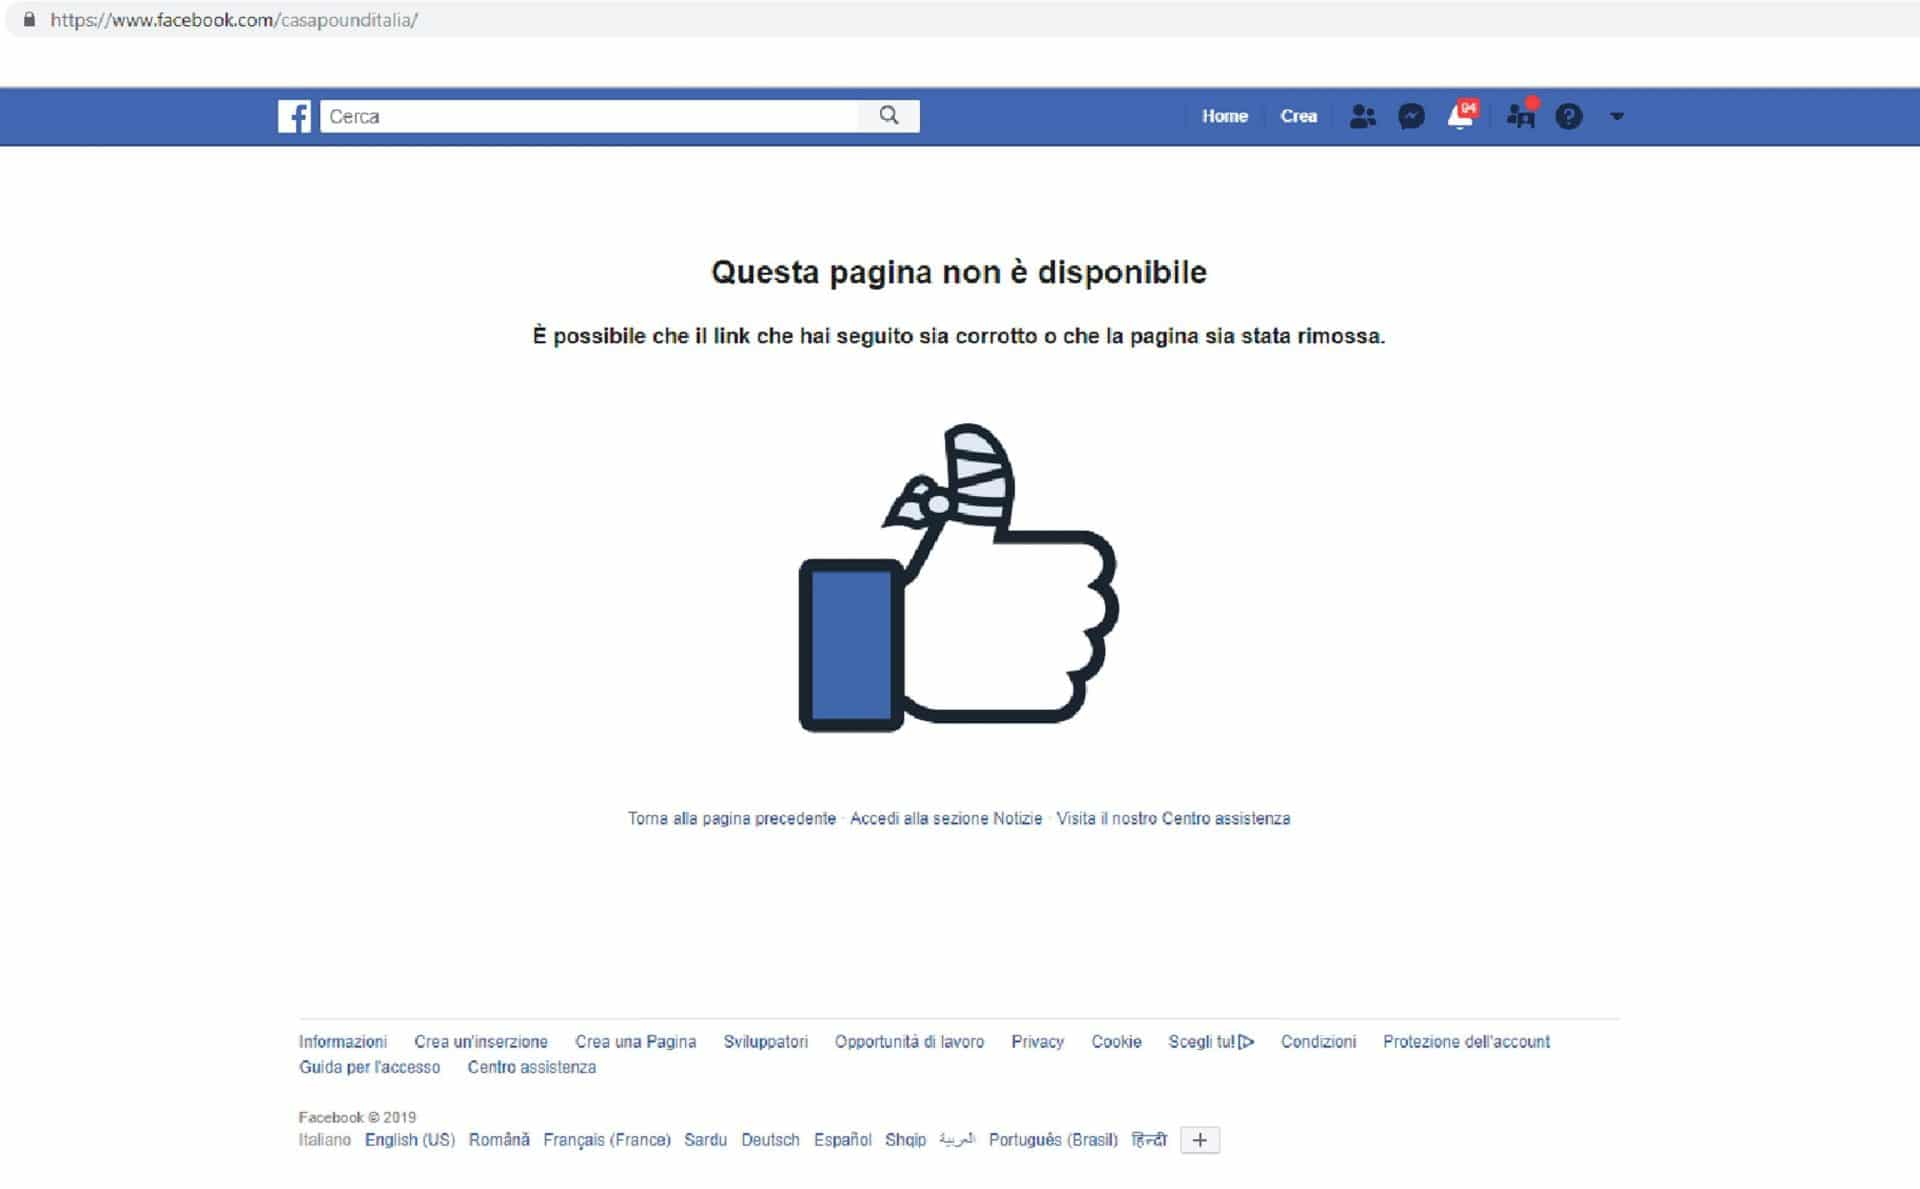 casapound facebook fascismo